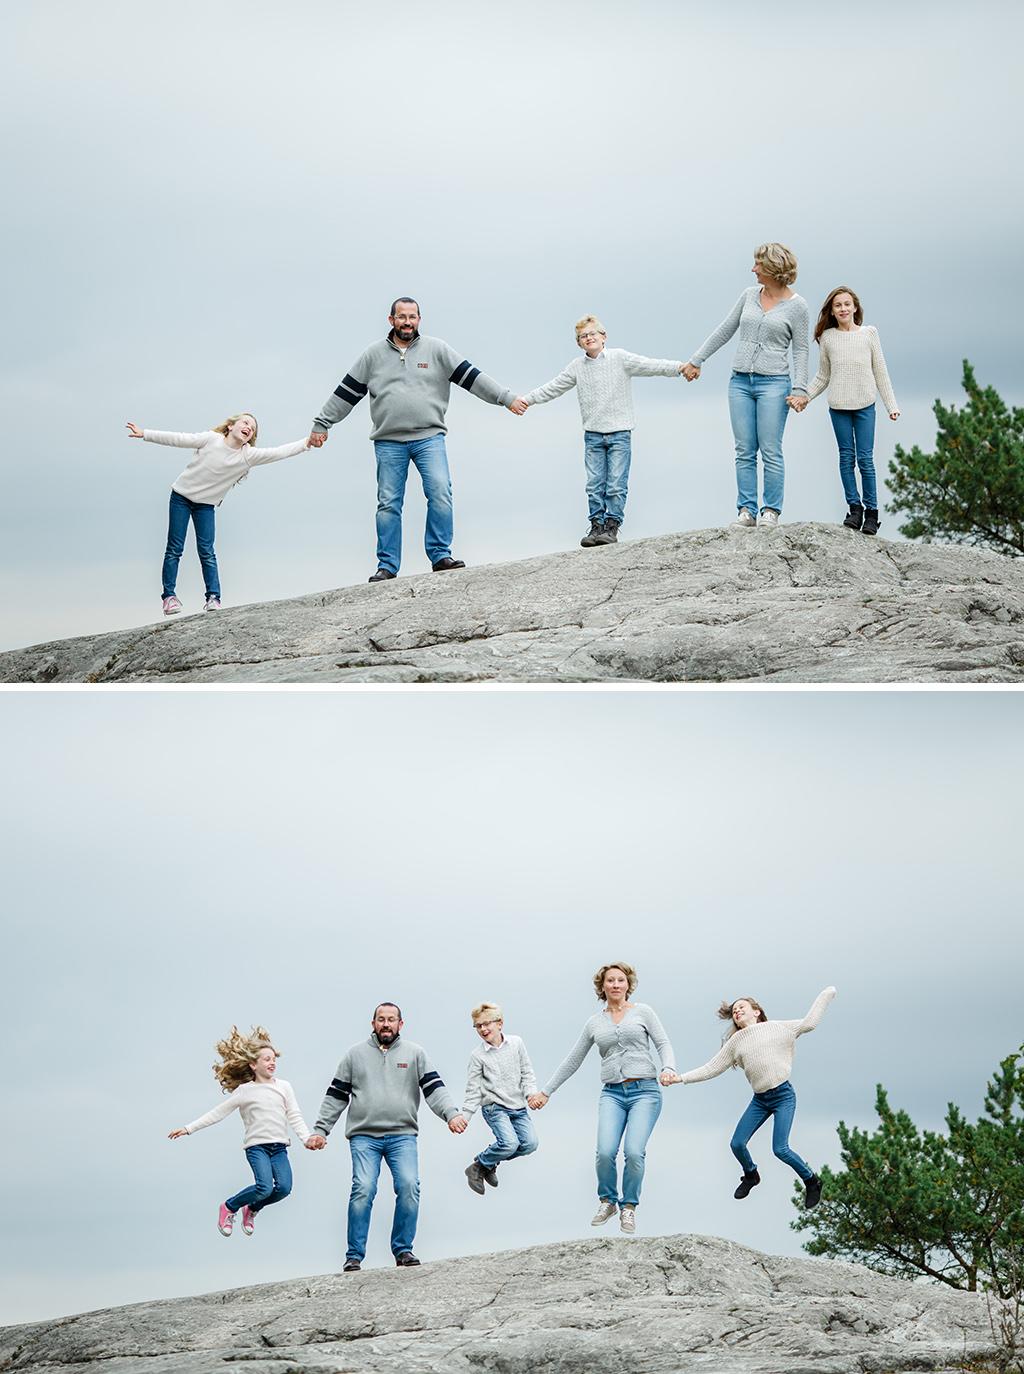 Familjefotografering_i-Stockholm_Lifestyle-familjefotograf-Anna-Sandstrom_5.jpg